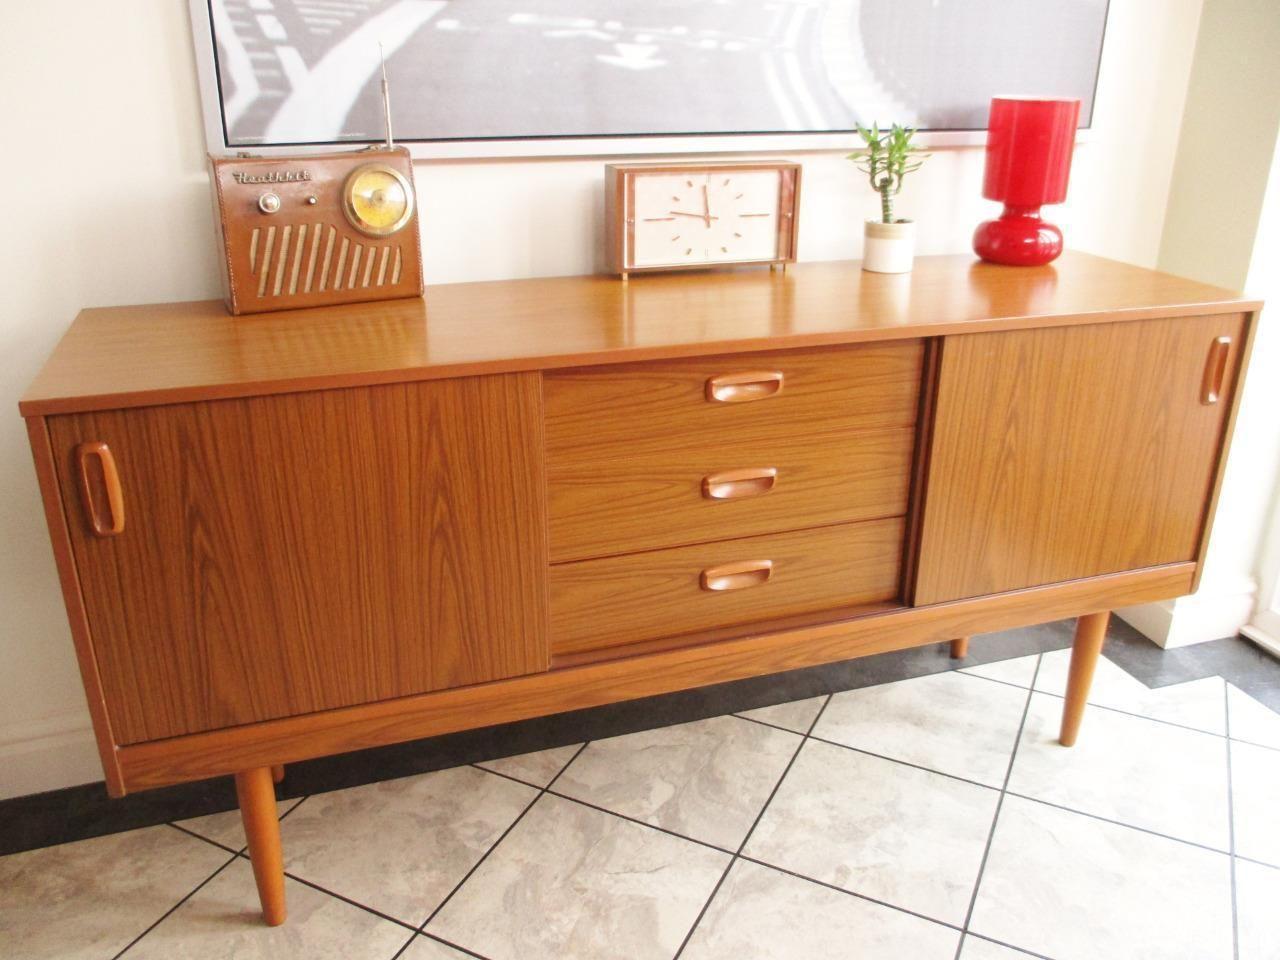 Vintage 70's Schreiber Retro Sideboard Unit Cabinet Teak Danish Midcentury  In Home, Furniture